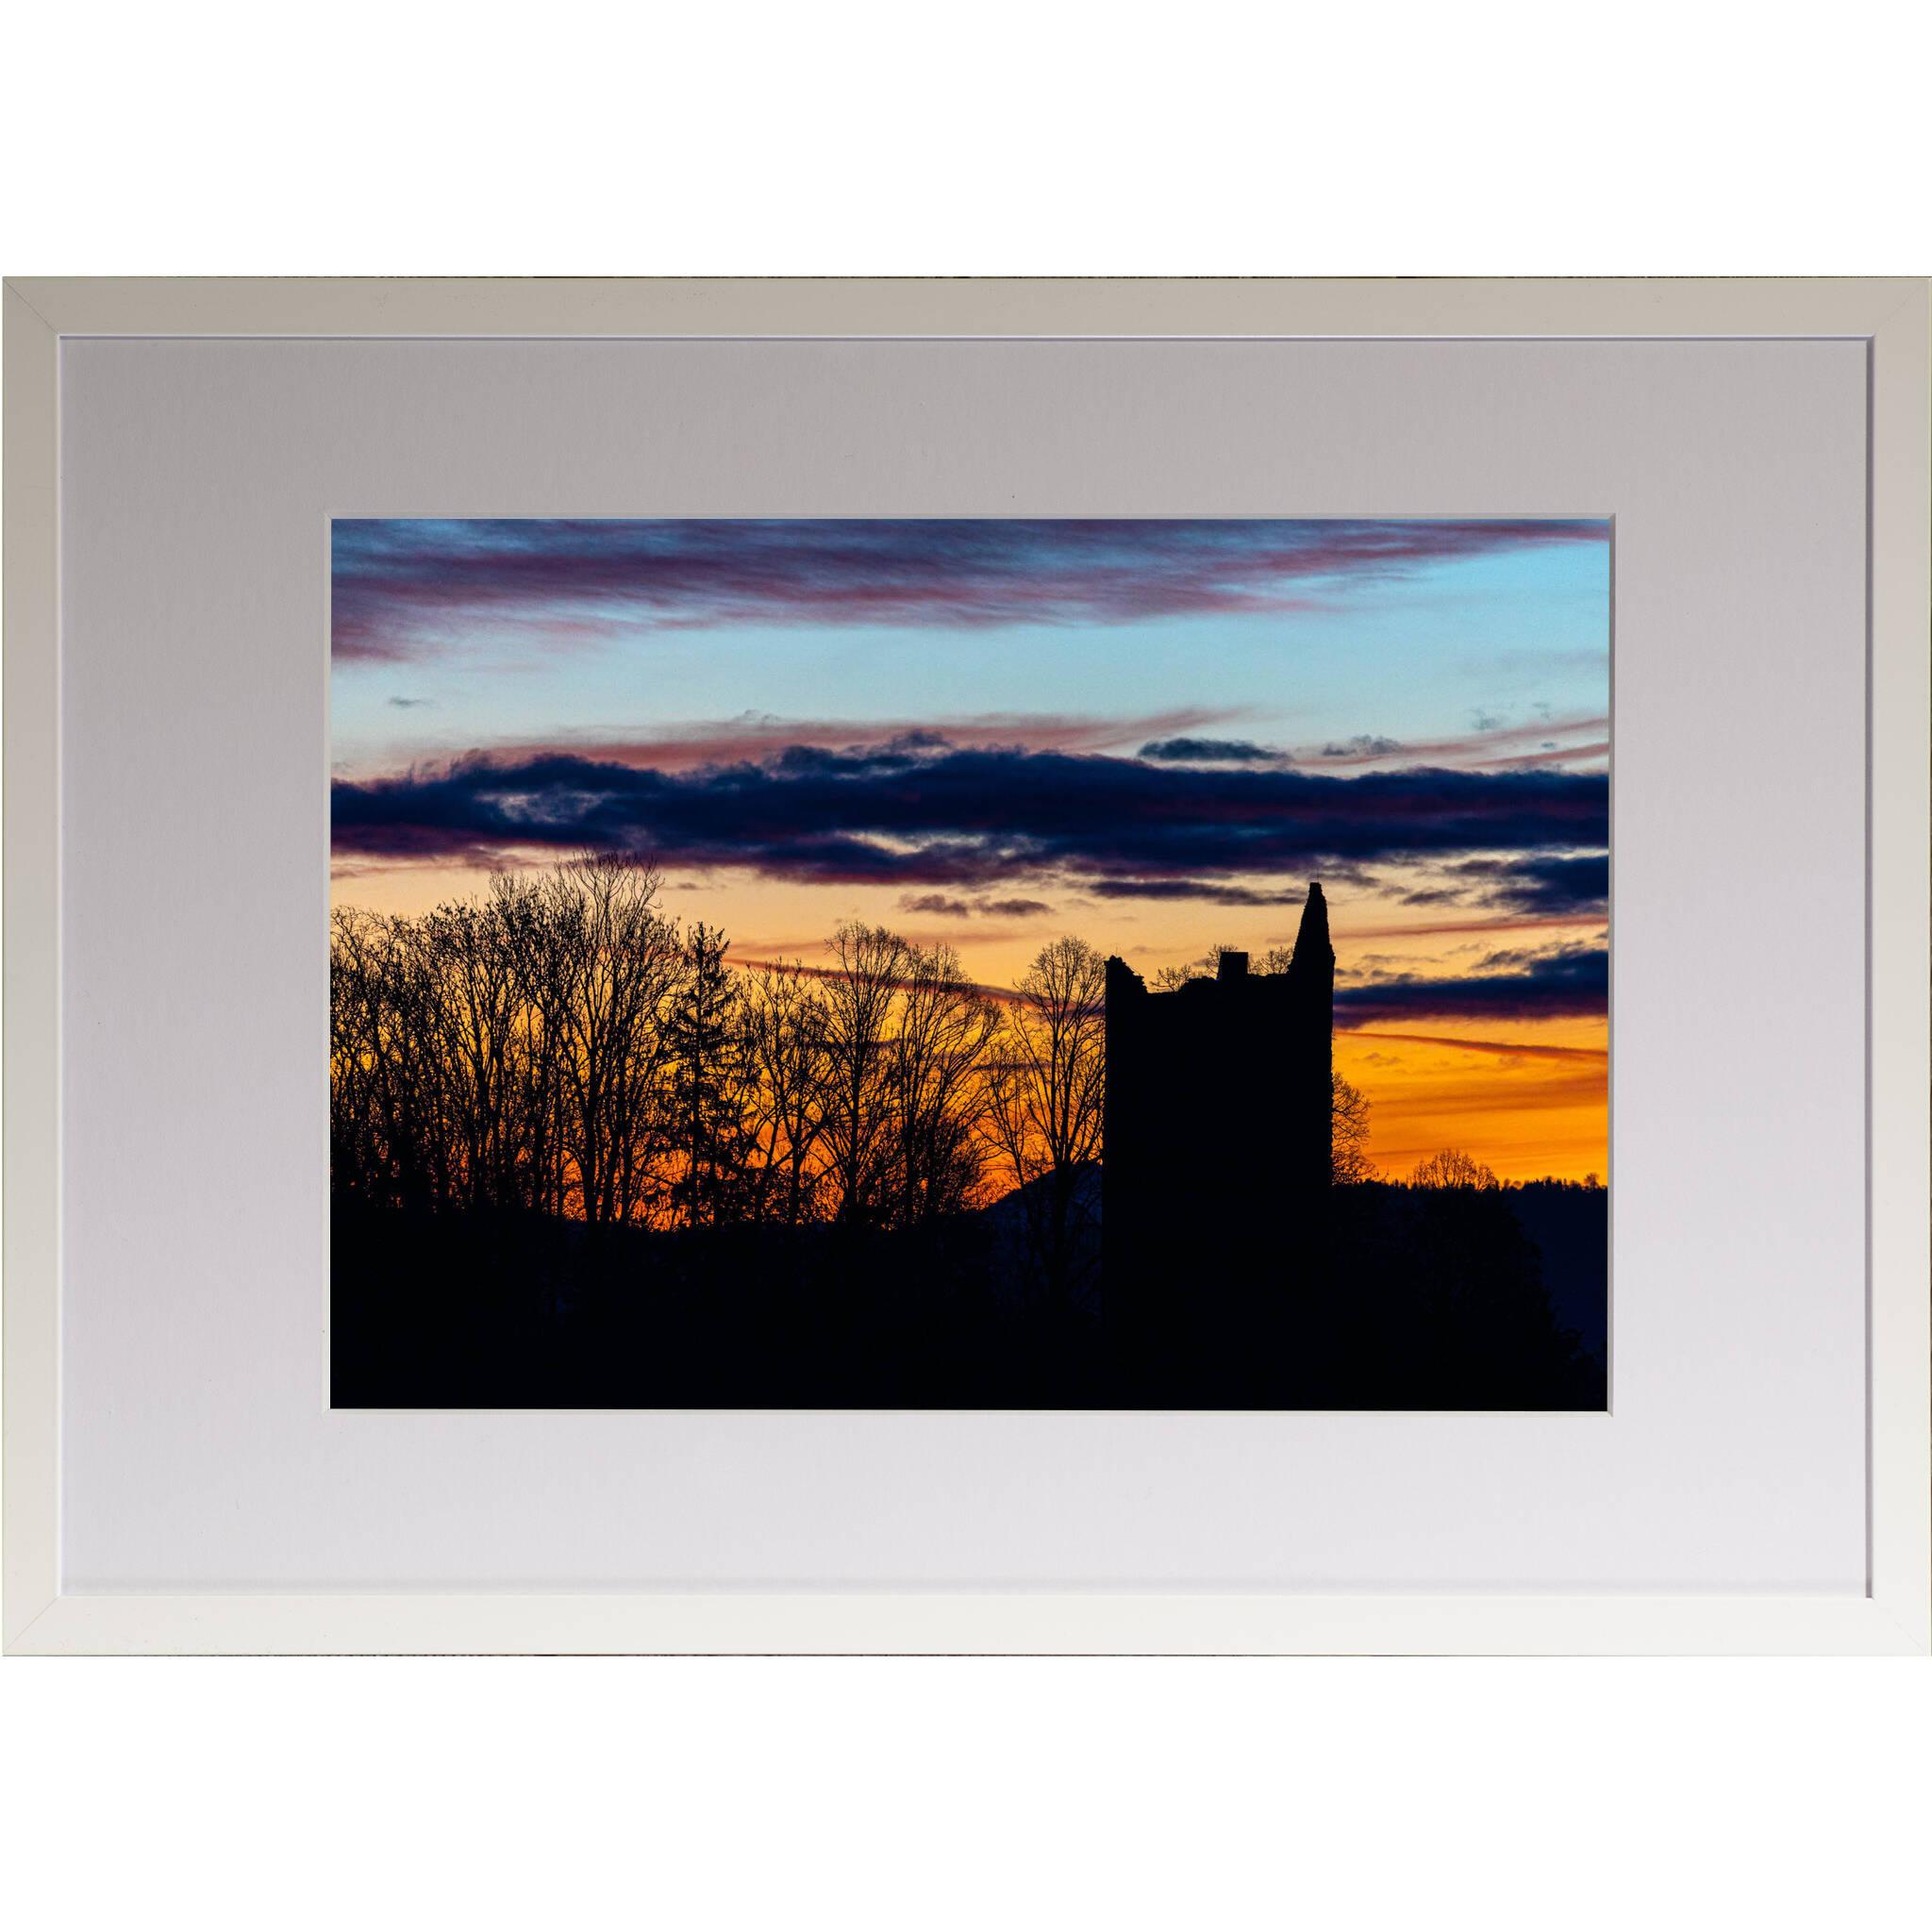 Burgruine im Sonnenuntergang Rahmen 'Riga' A3 mit Passepartout